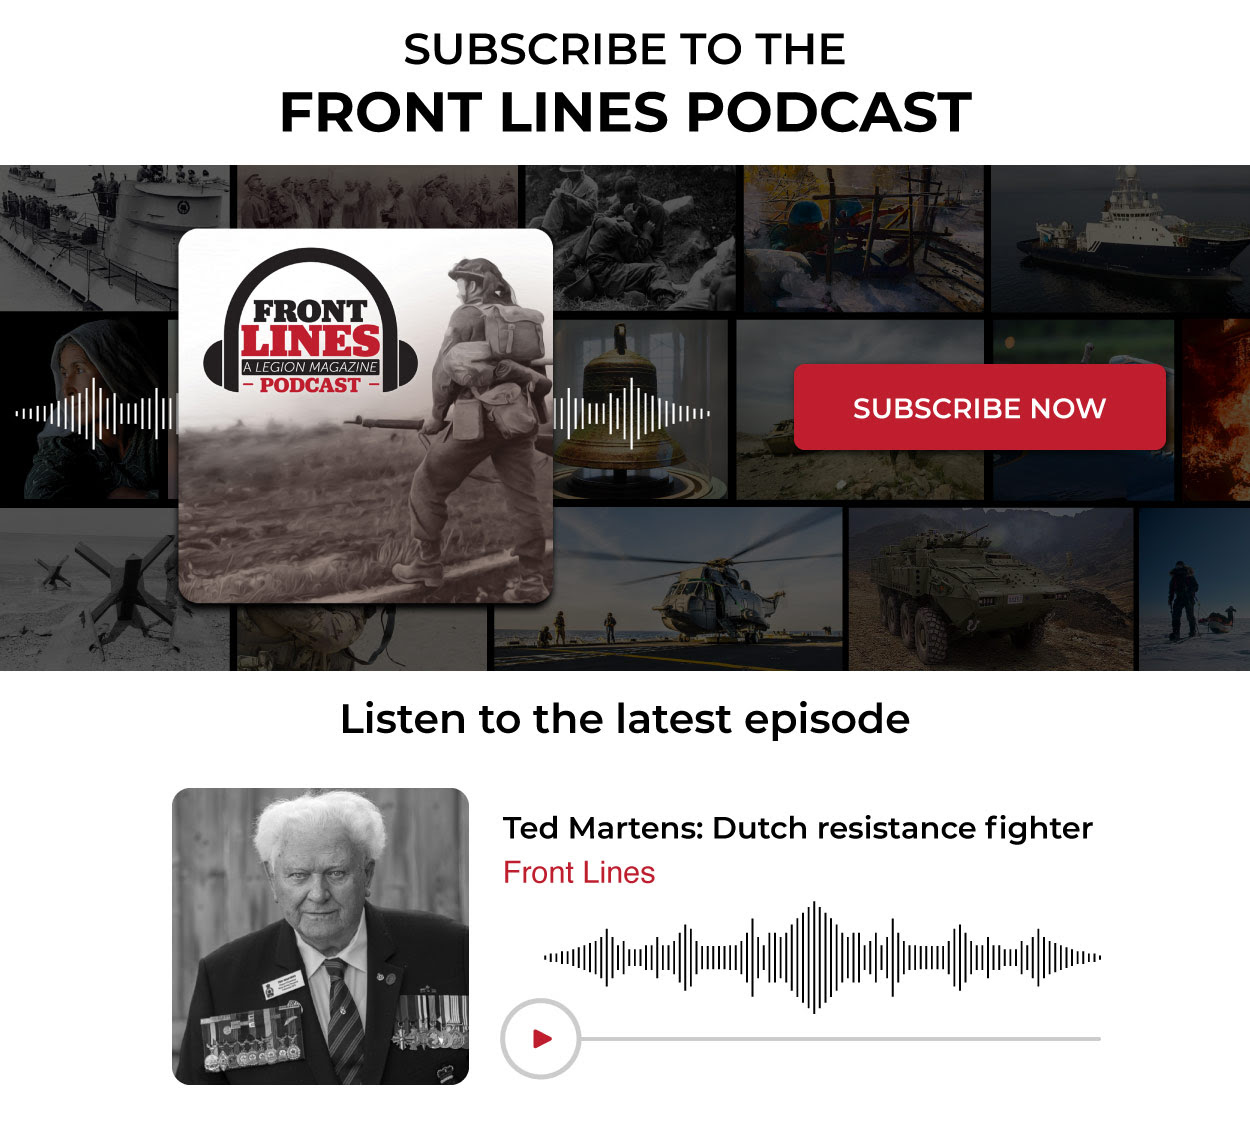 Ted Martens: Dutch resistance fighter